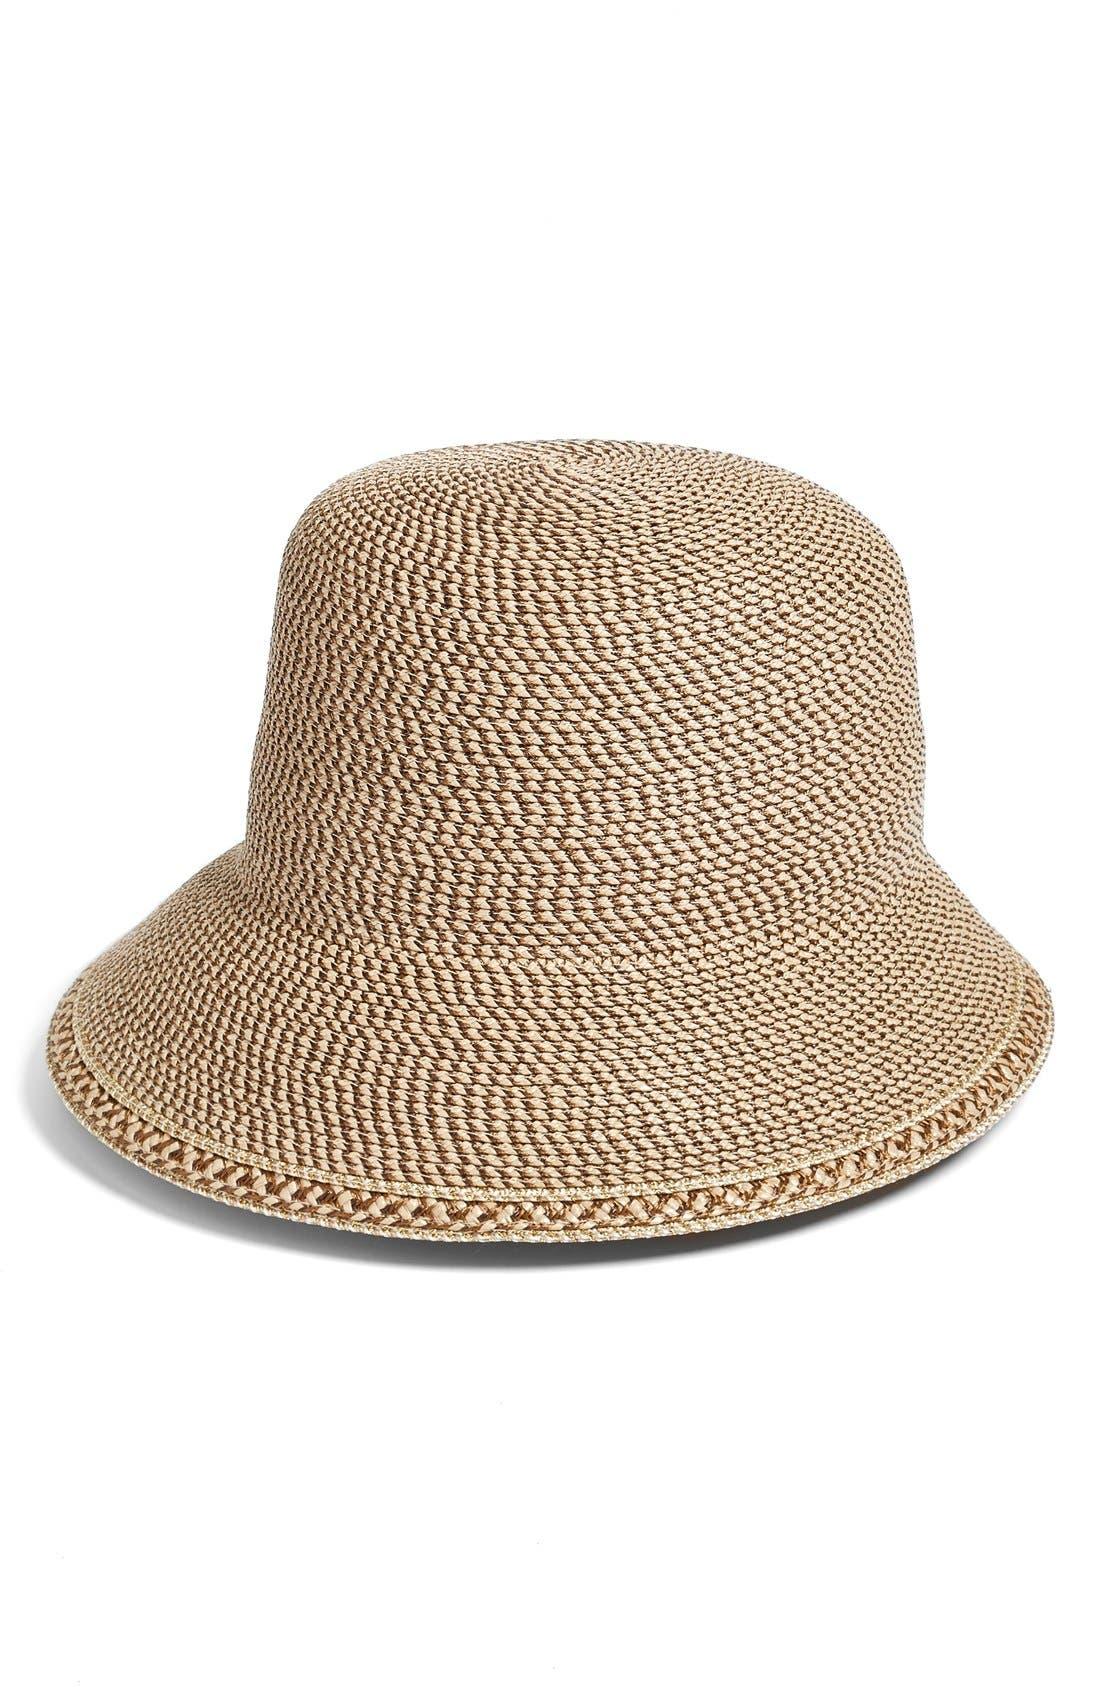 ERIC JAVITS 'Squishee®' Bucket Hat